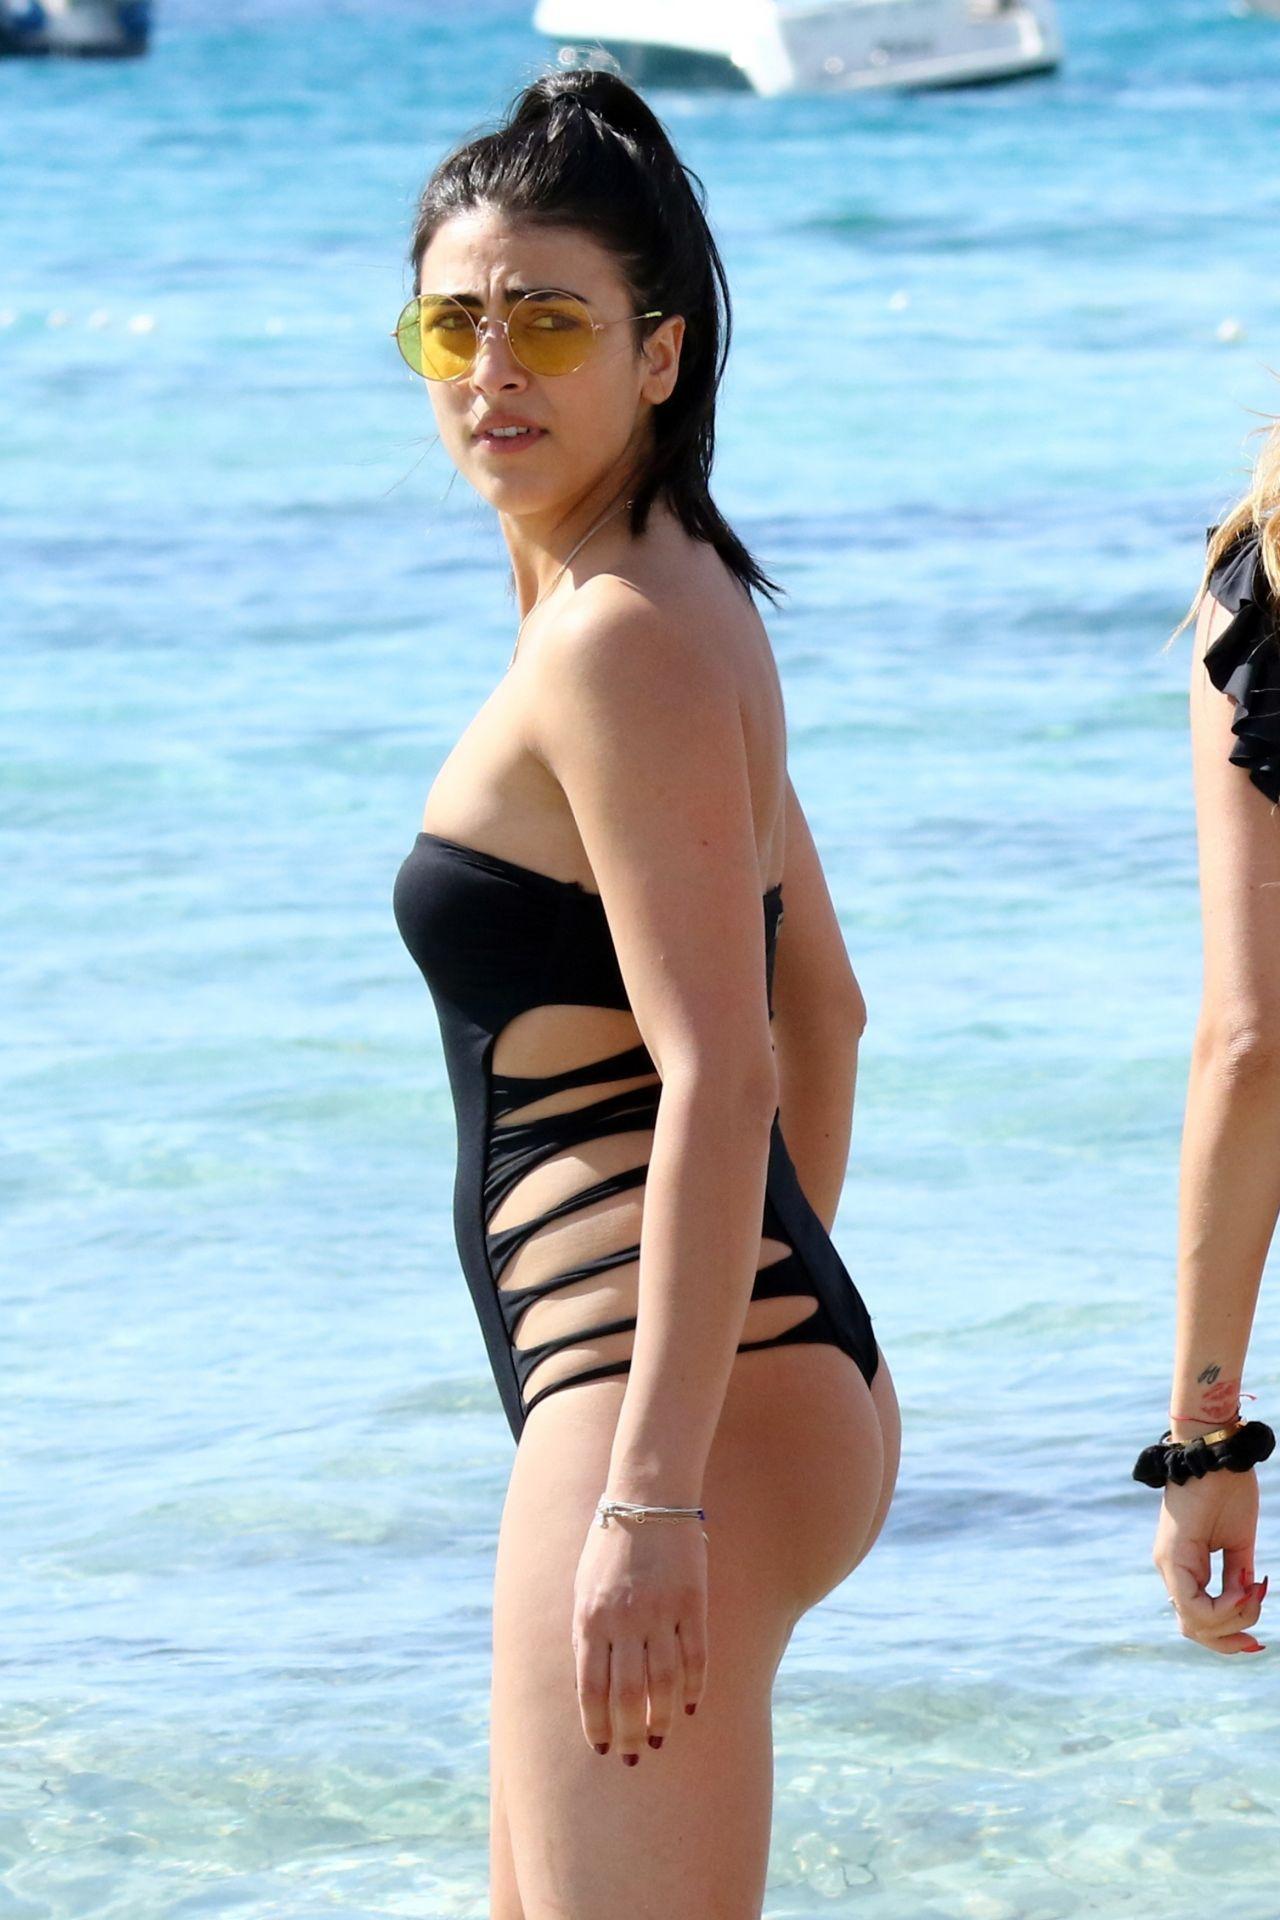 underwear Bikini Alessia Tedeschi naked photo 2017